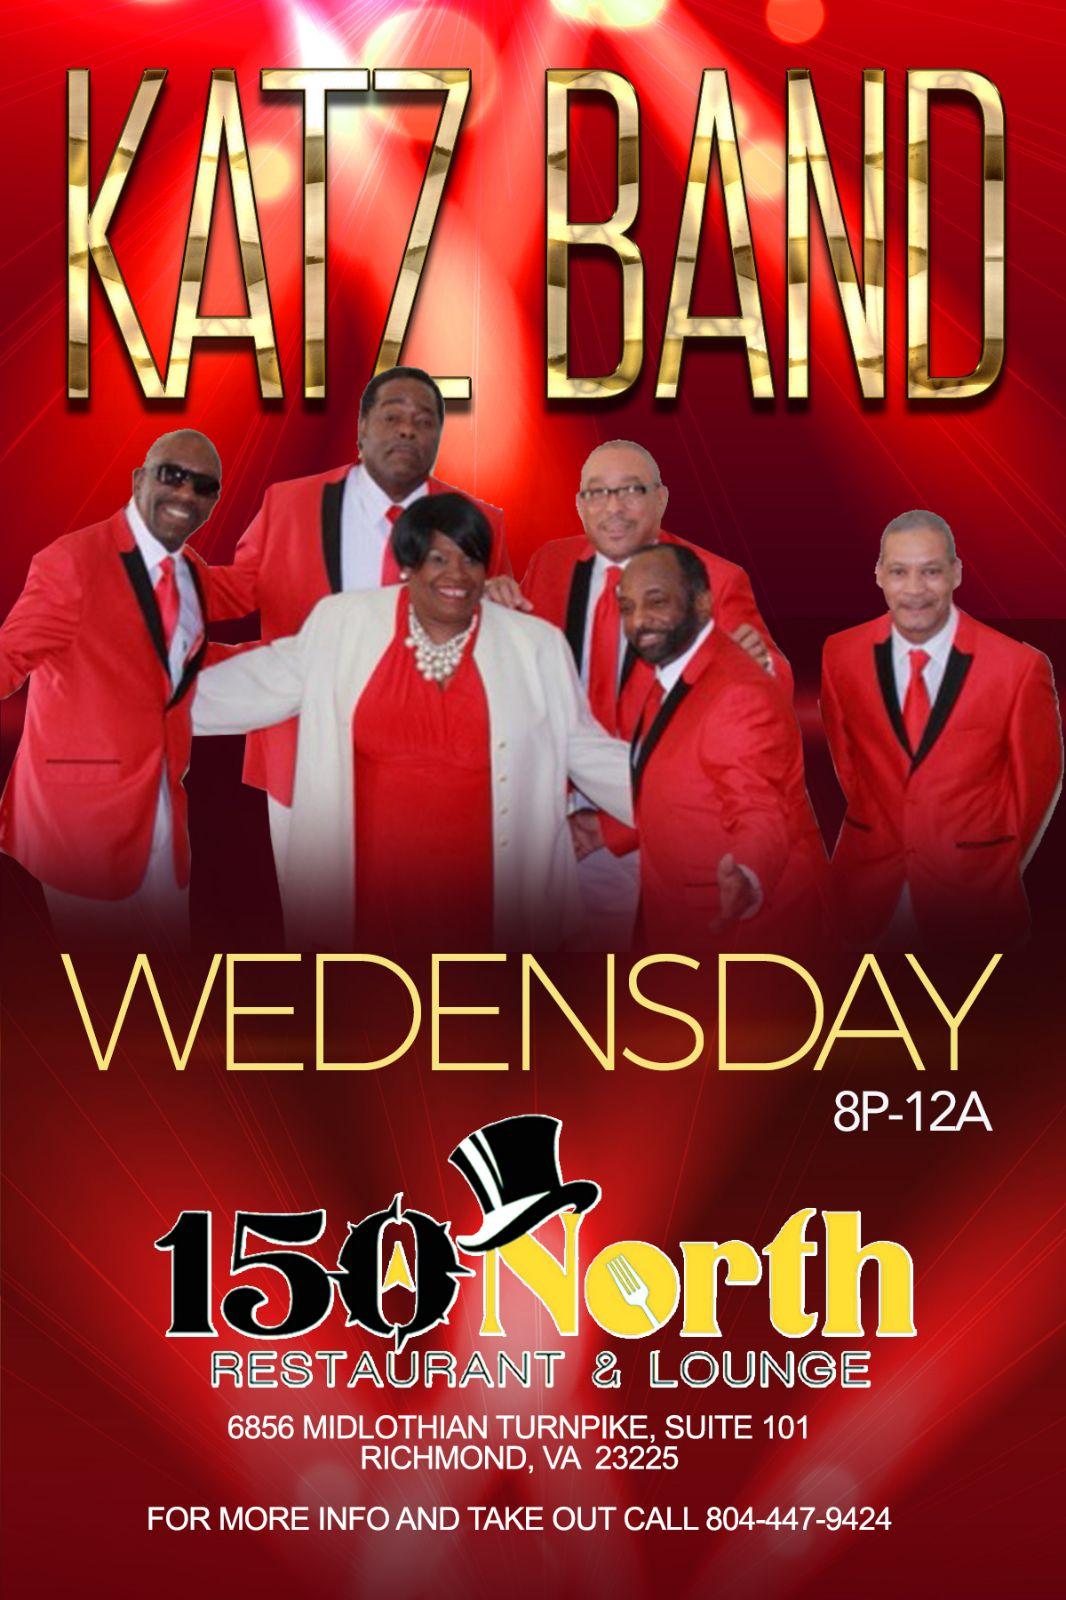 150 North Restaurant